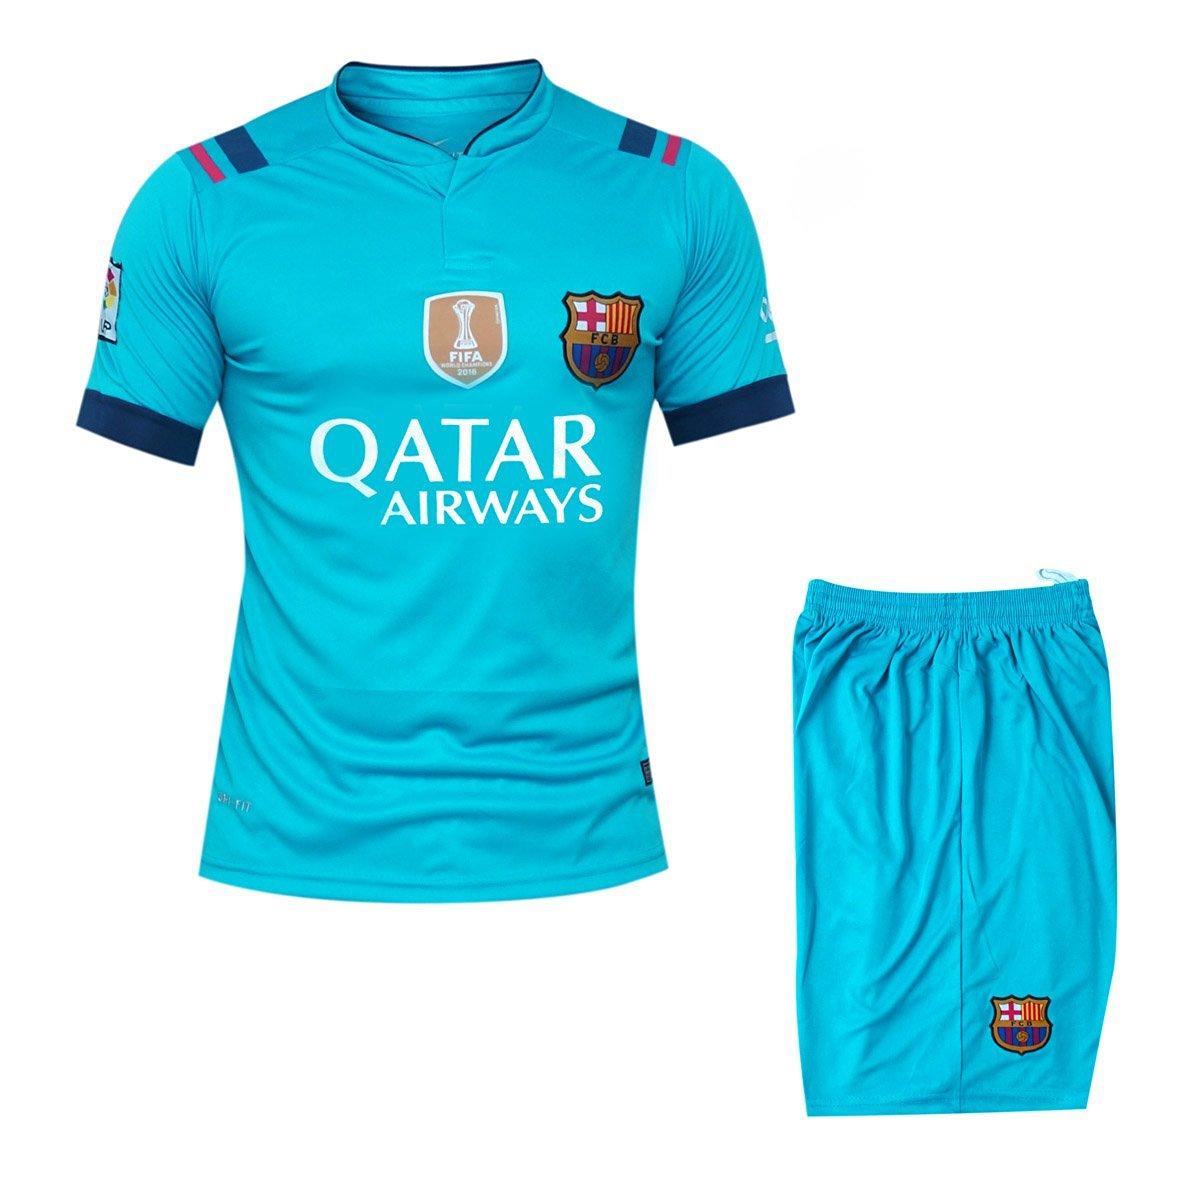 premium selection a75c2 9cc8b Buy Barcelona Fc Football Shirt Kit Hanging Car Air ...